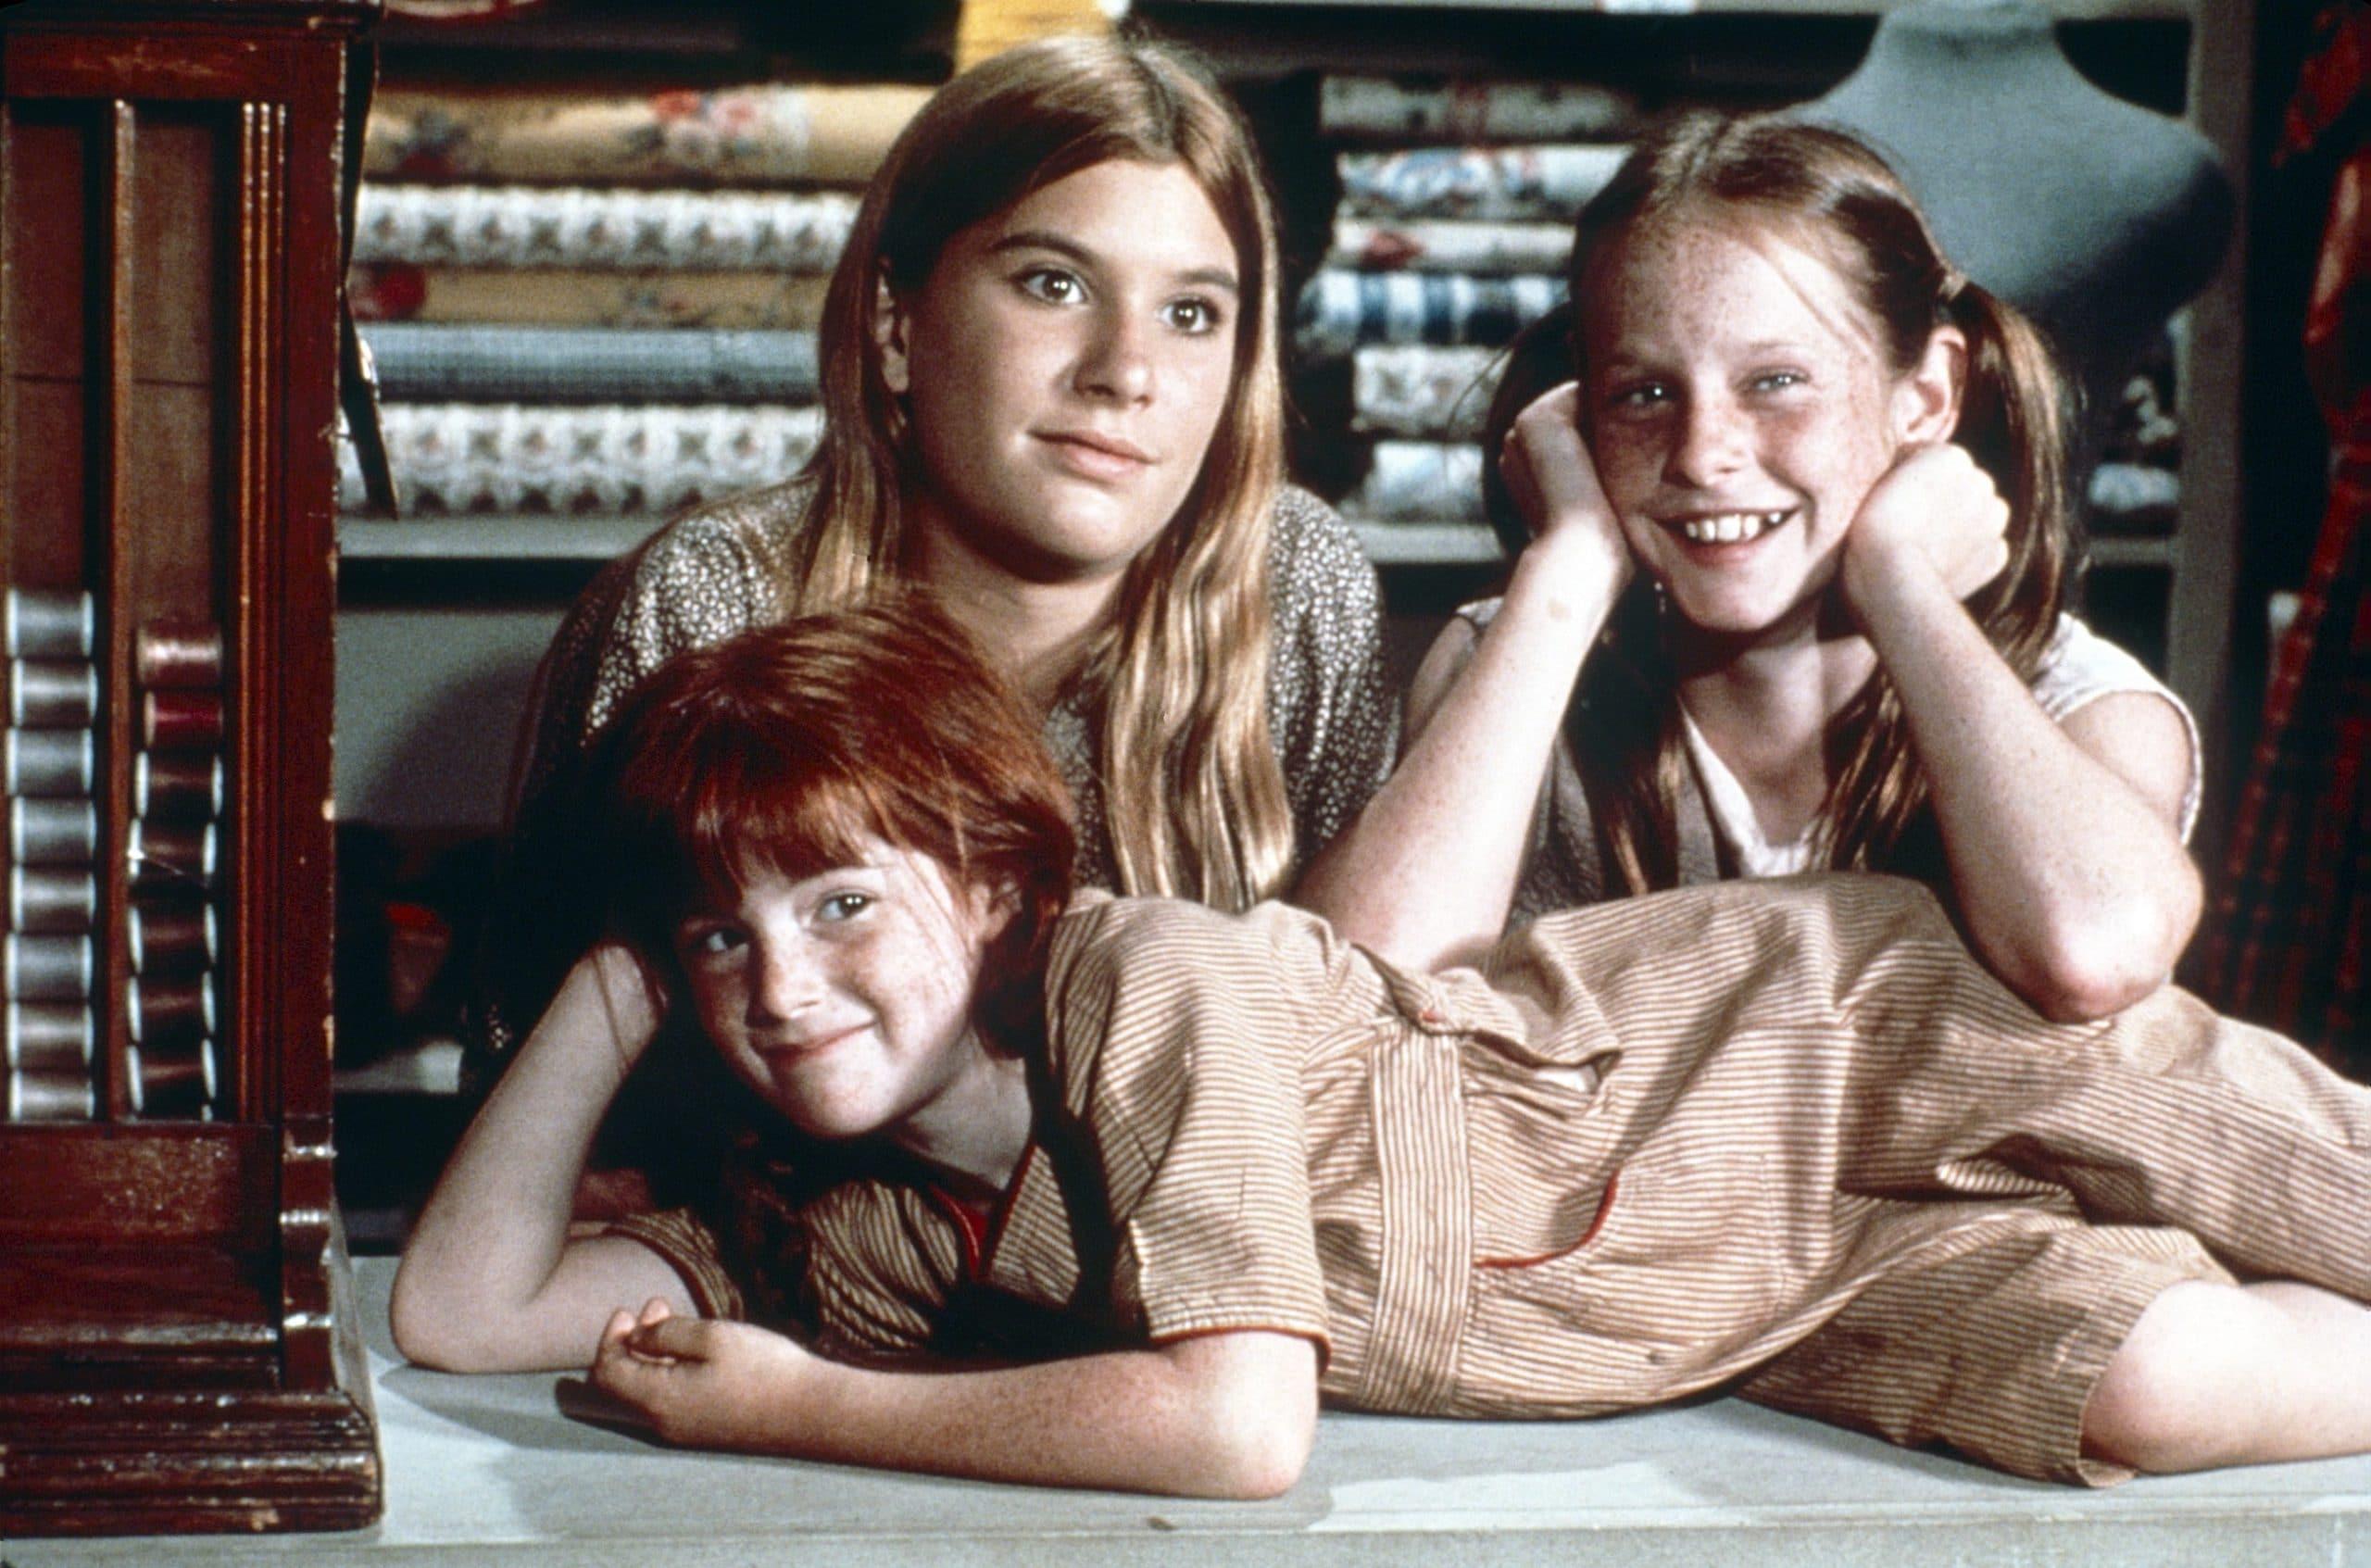 THE WALTONS, from left: Kami Cotler (front), Judy Norton, Mary Elizabeth McDonough